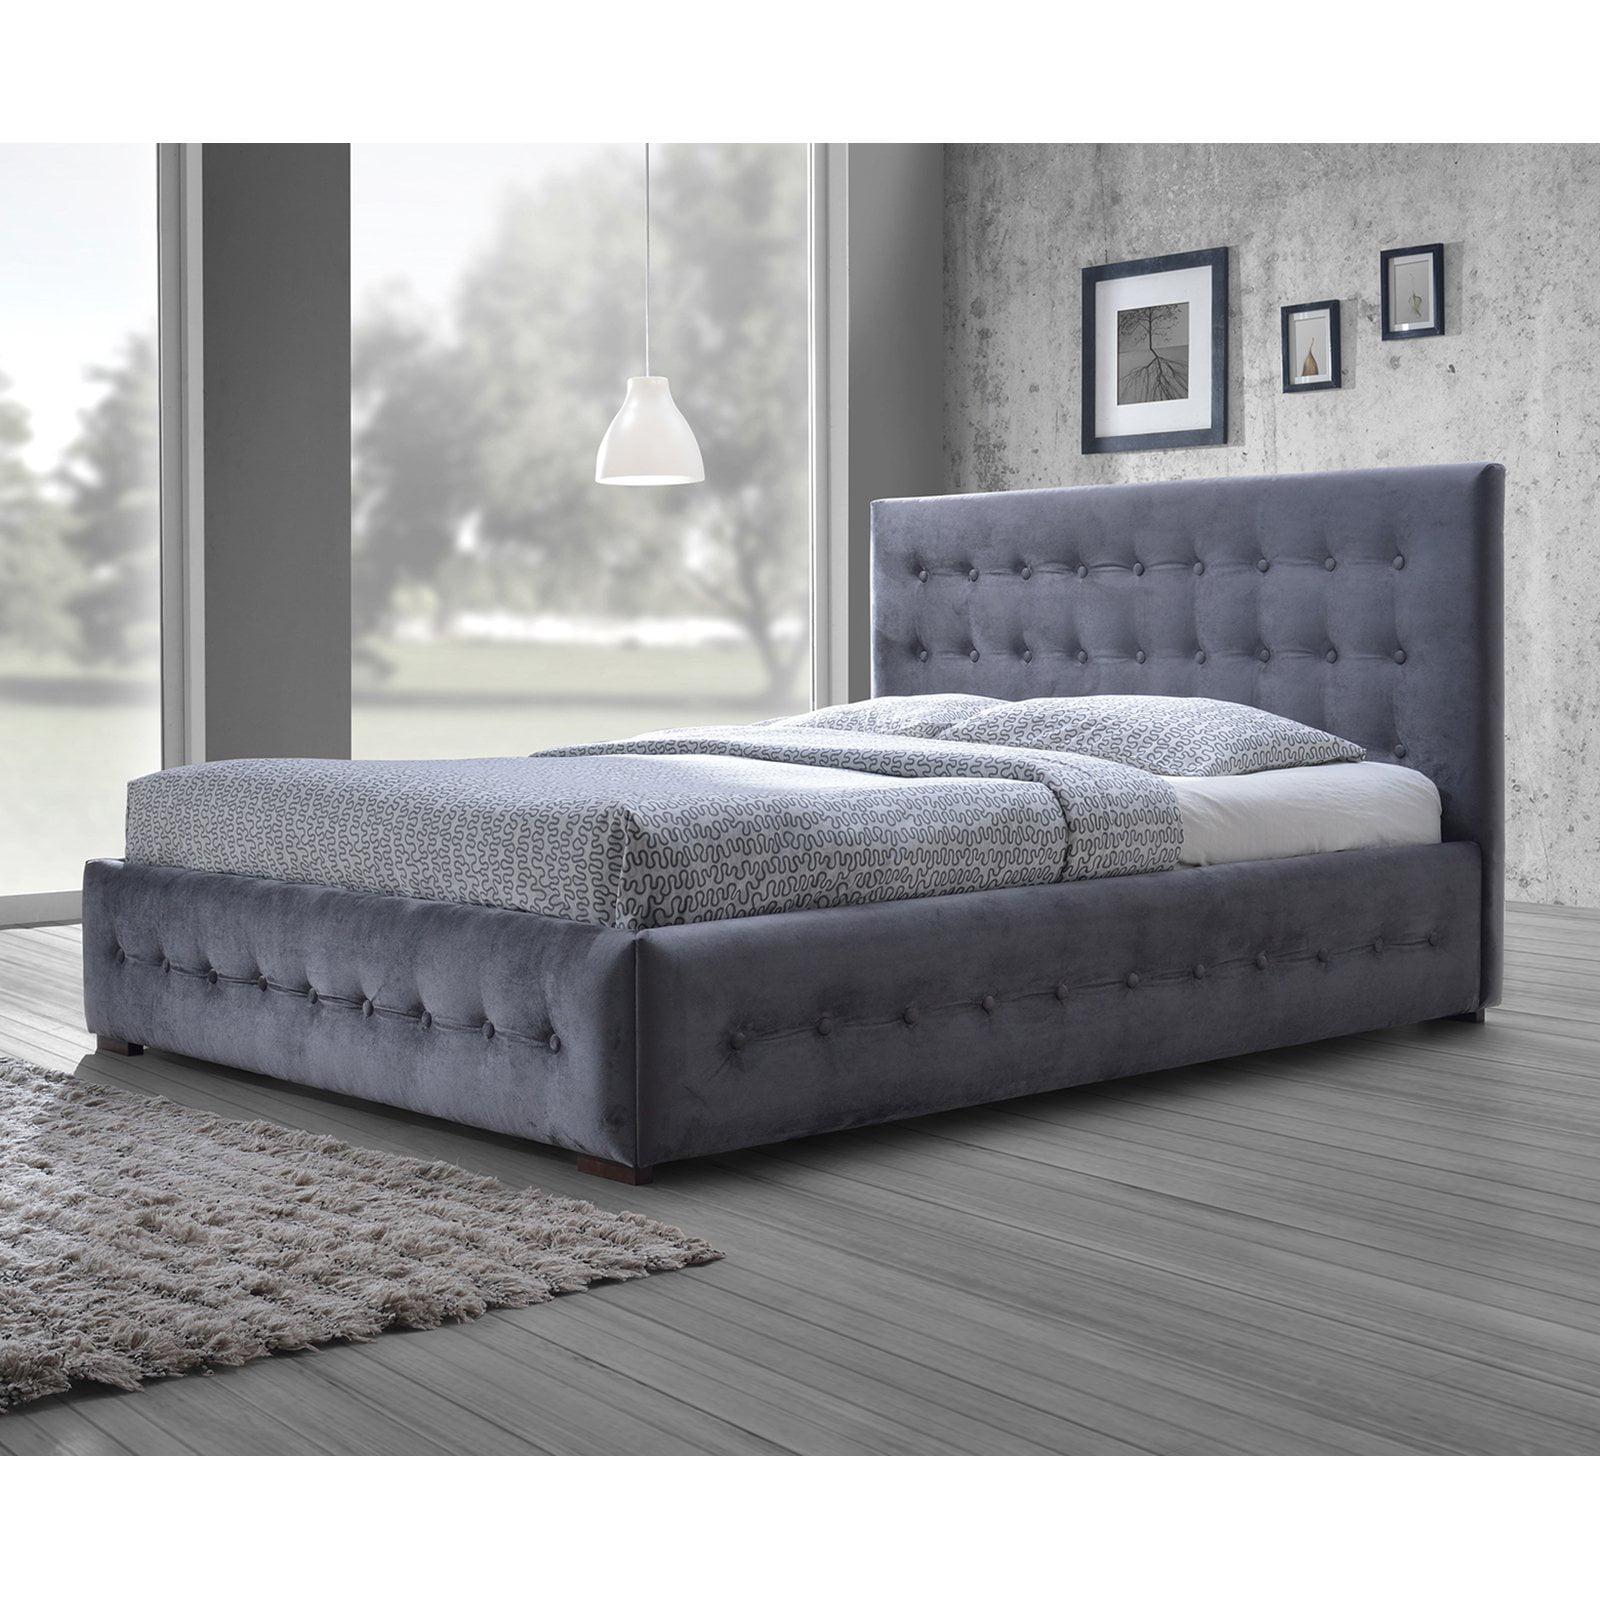 upholstered platform leatherette white elegant bed home ideas